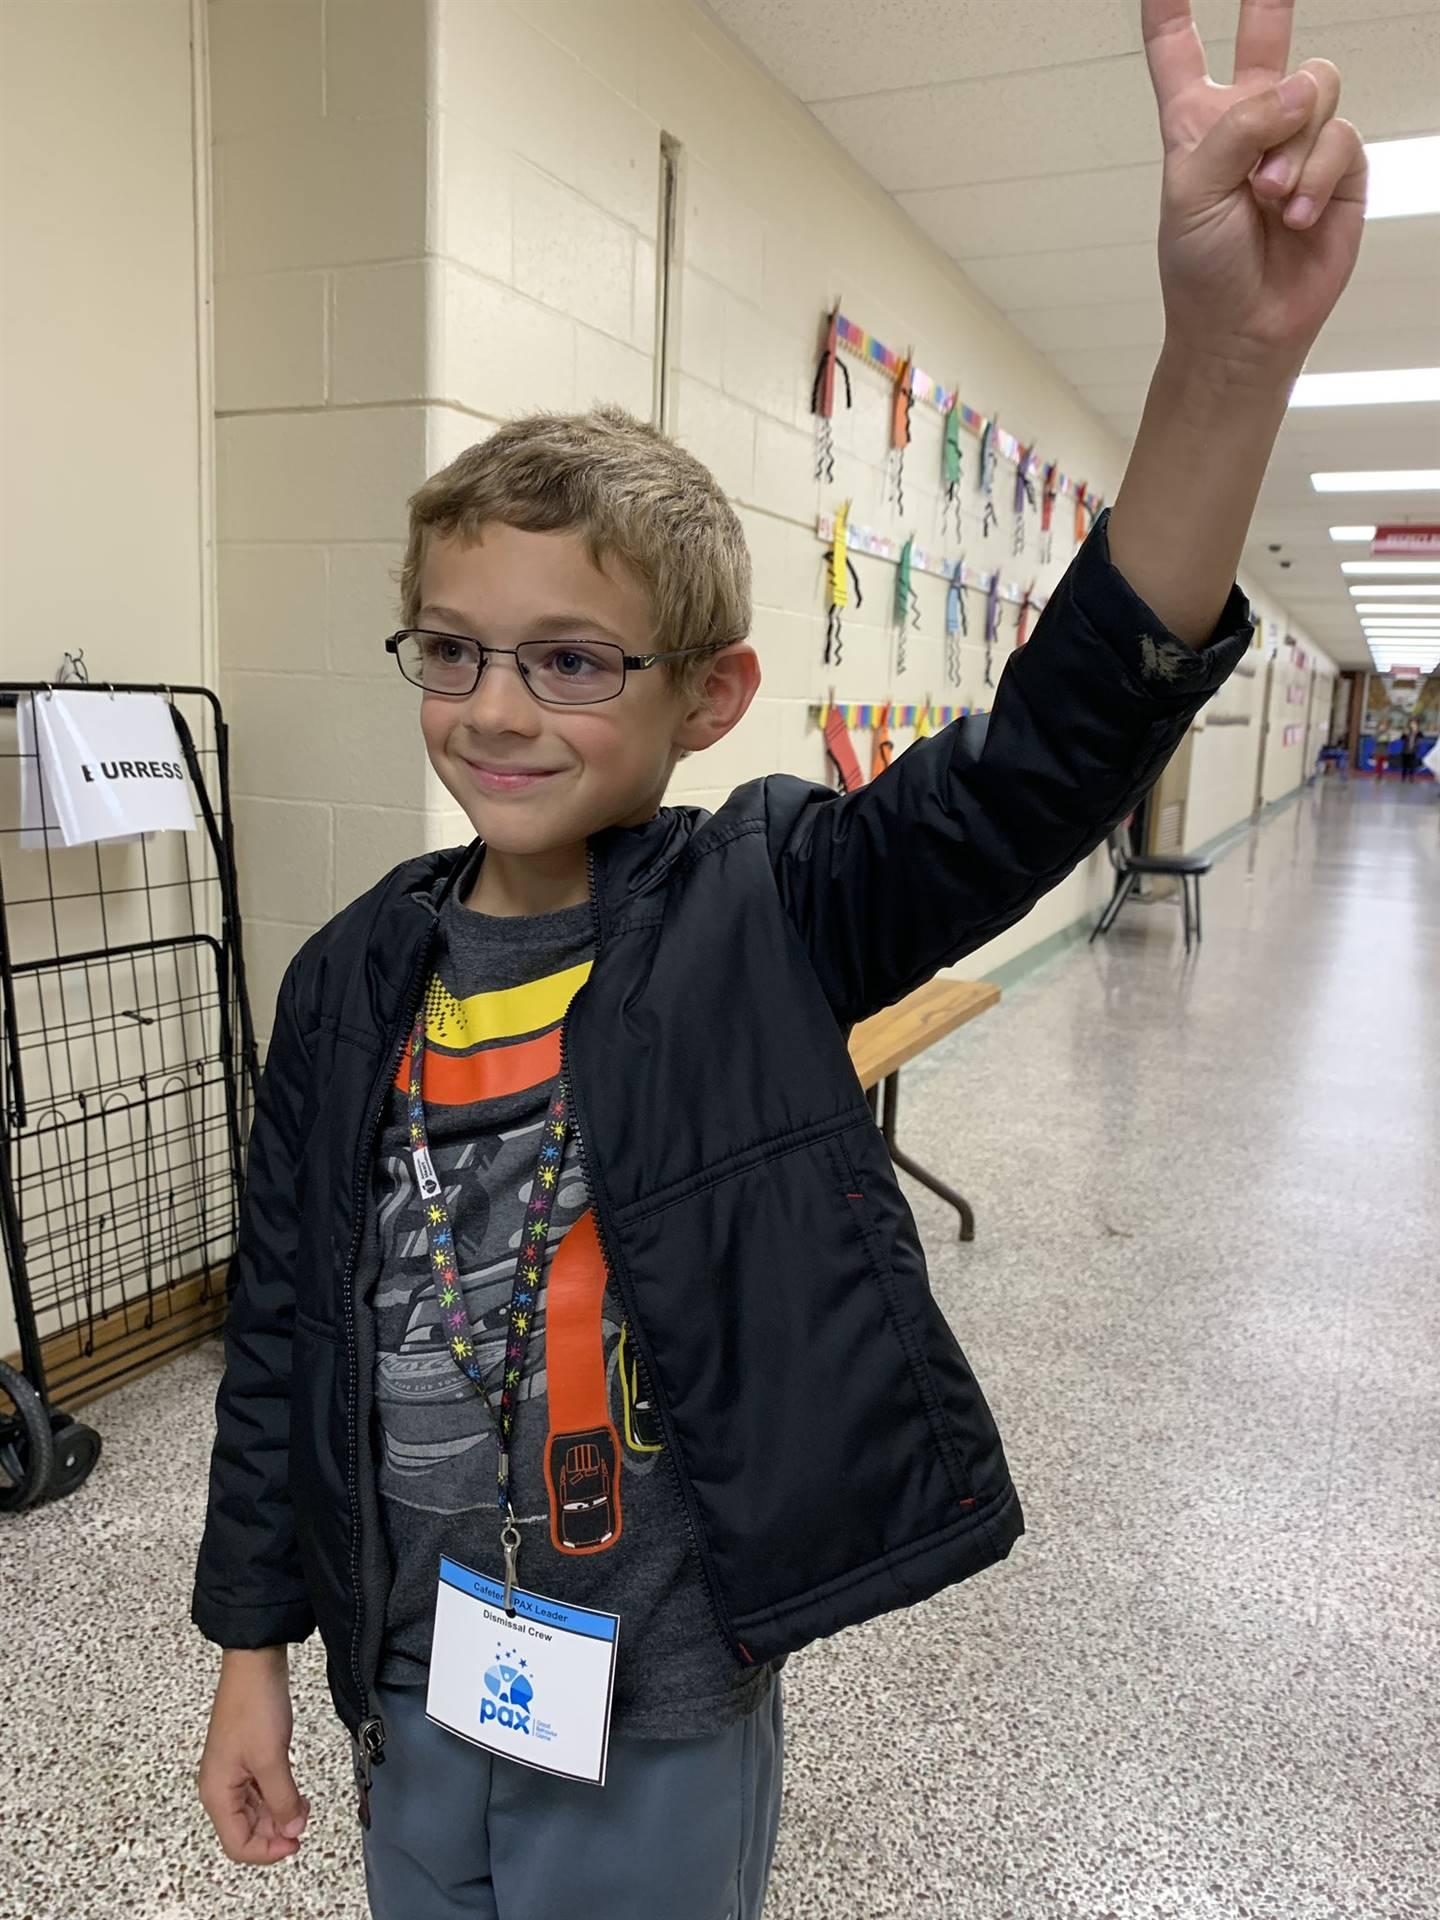 Munson Elementary PAX Leader (student) - Fall 2019